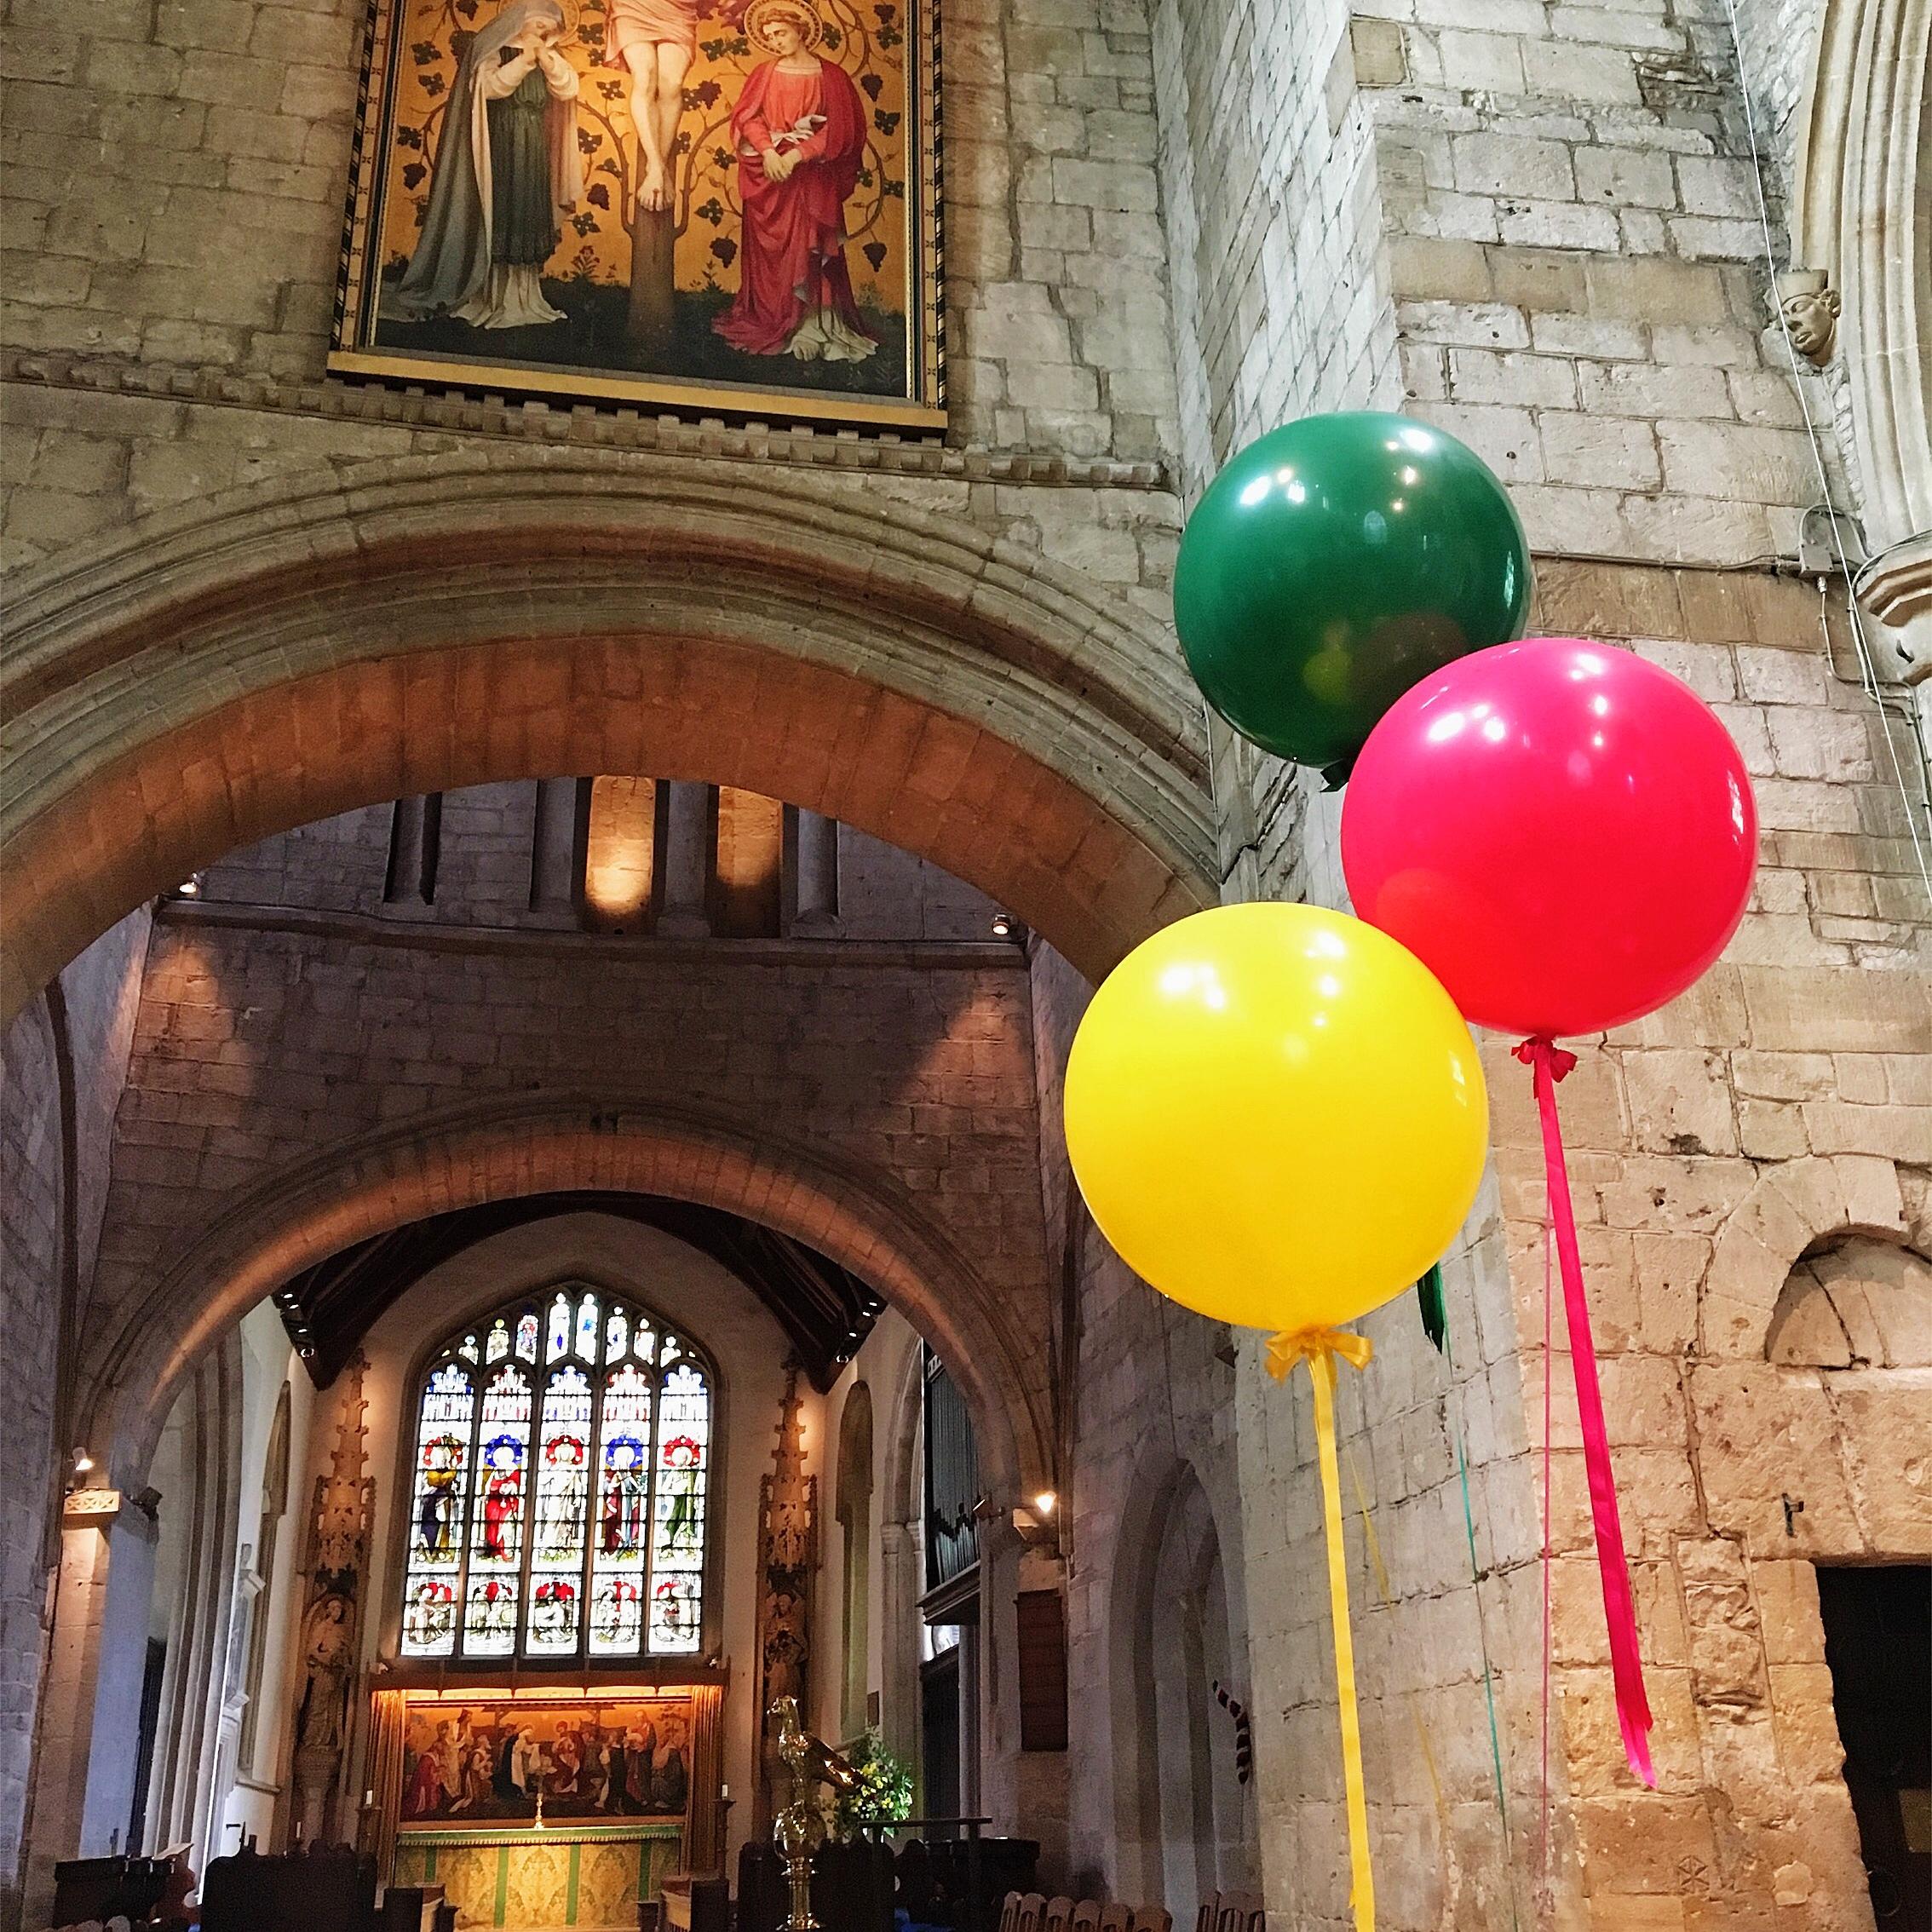 Giant Wedding Balloons in Church